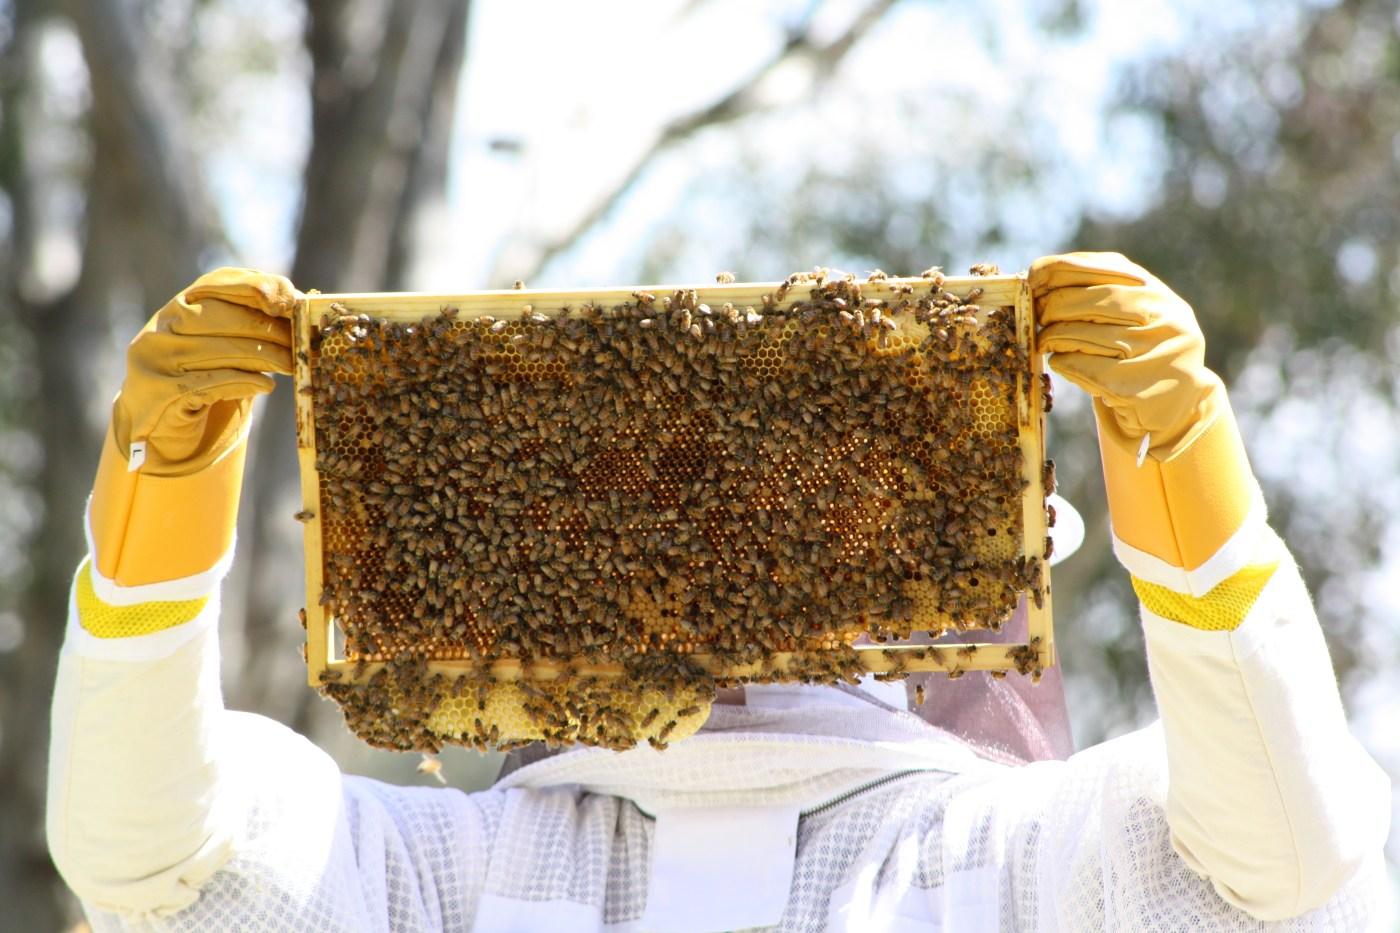 Bees on langstroth frame